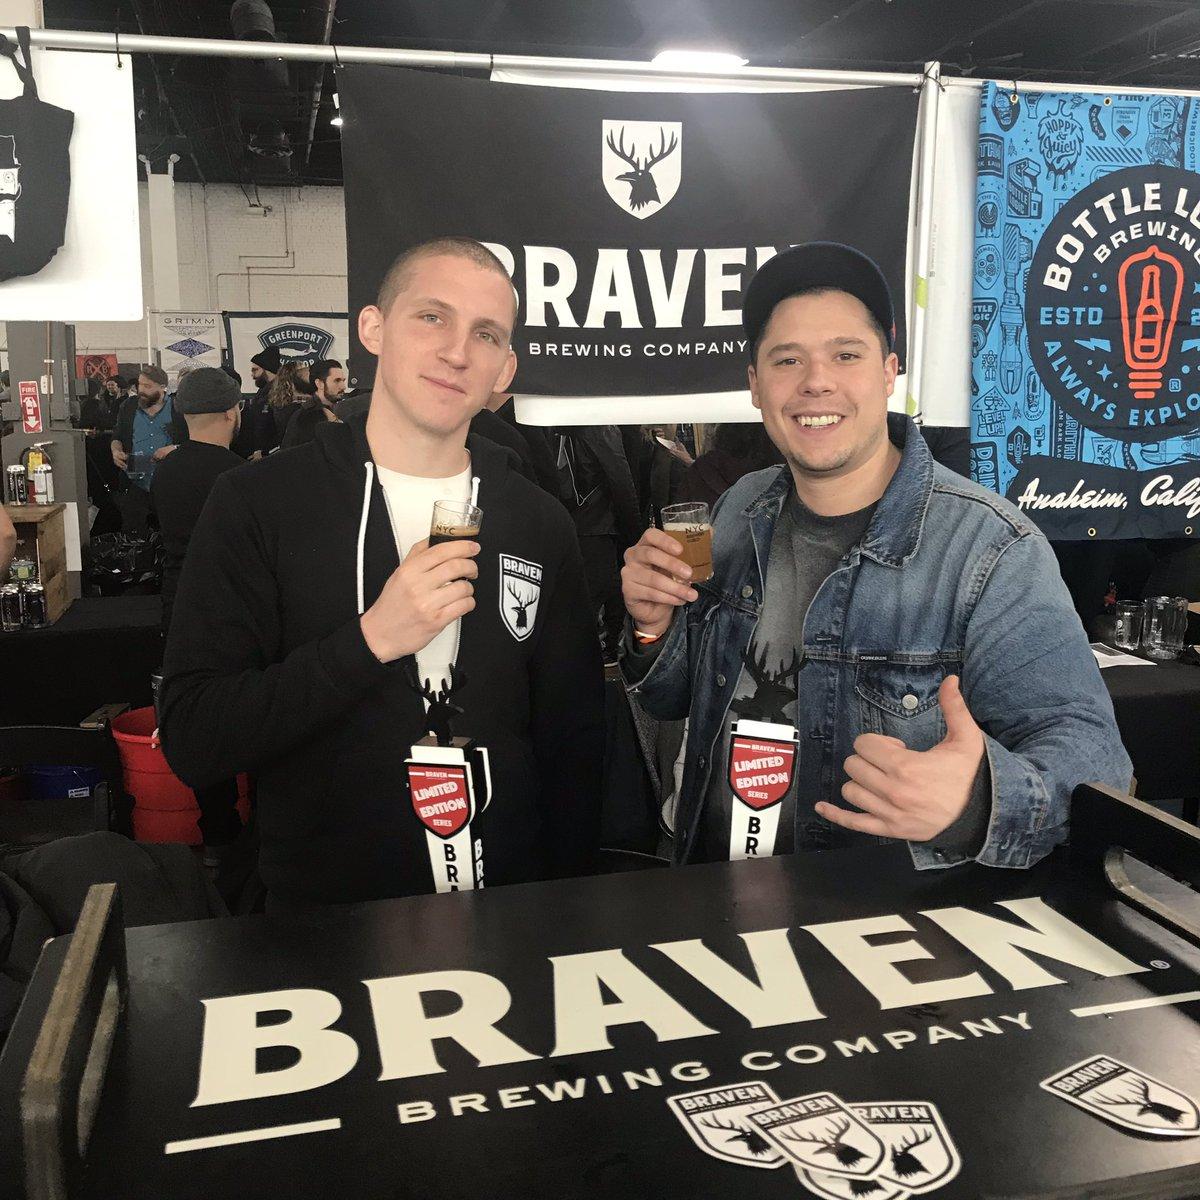 Braven Brewing Co  (@BravenBrewing) | Twitter